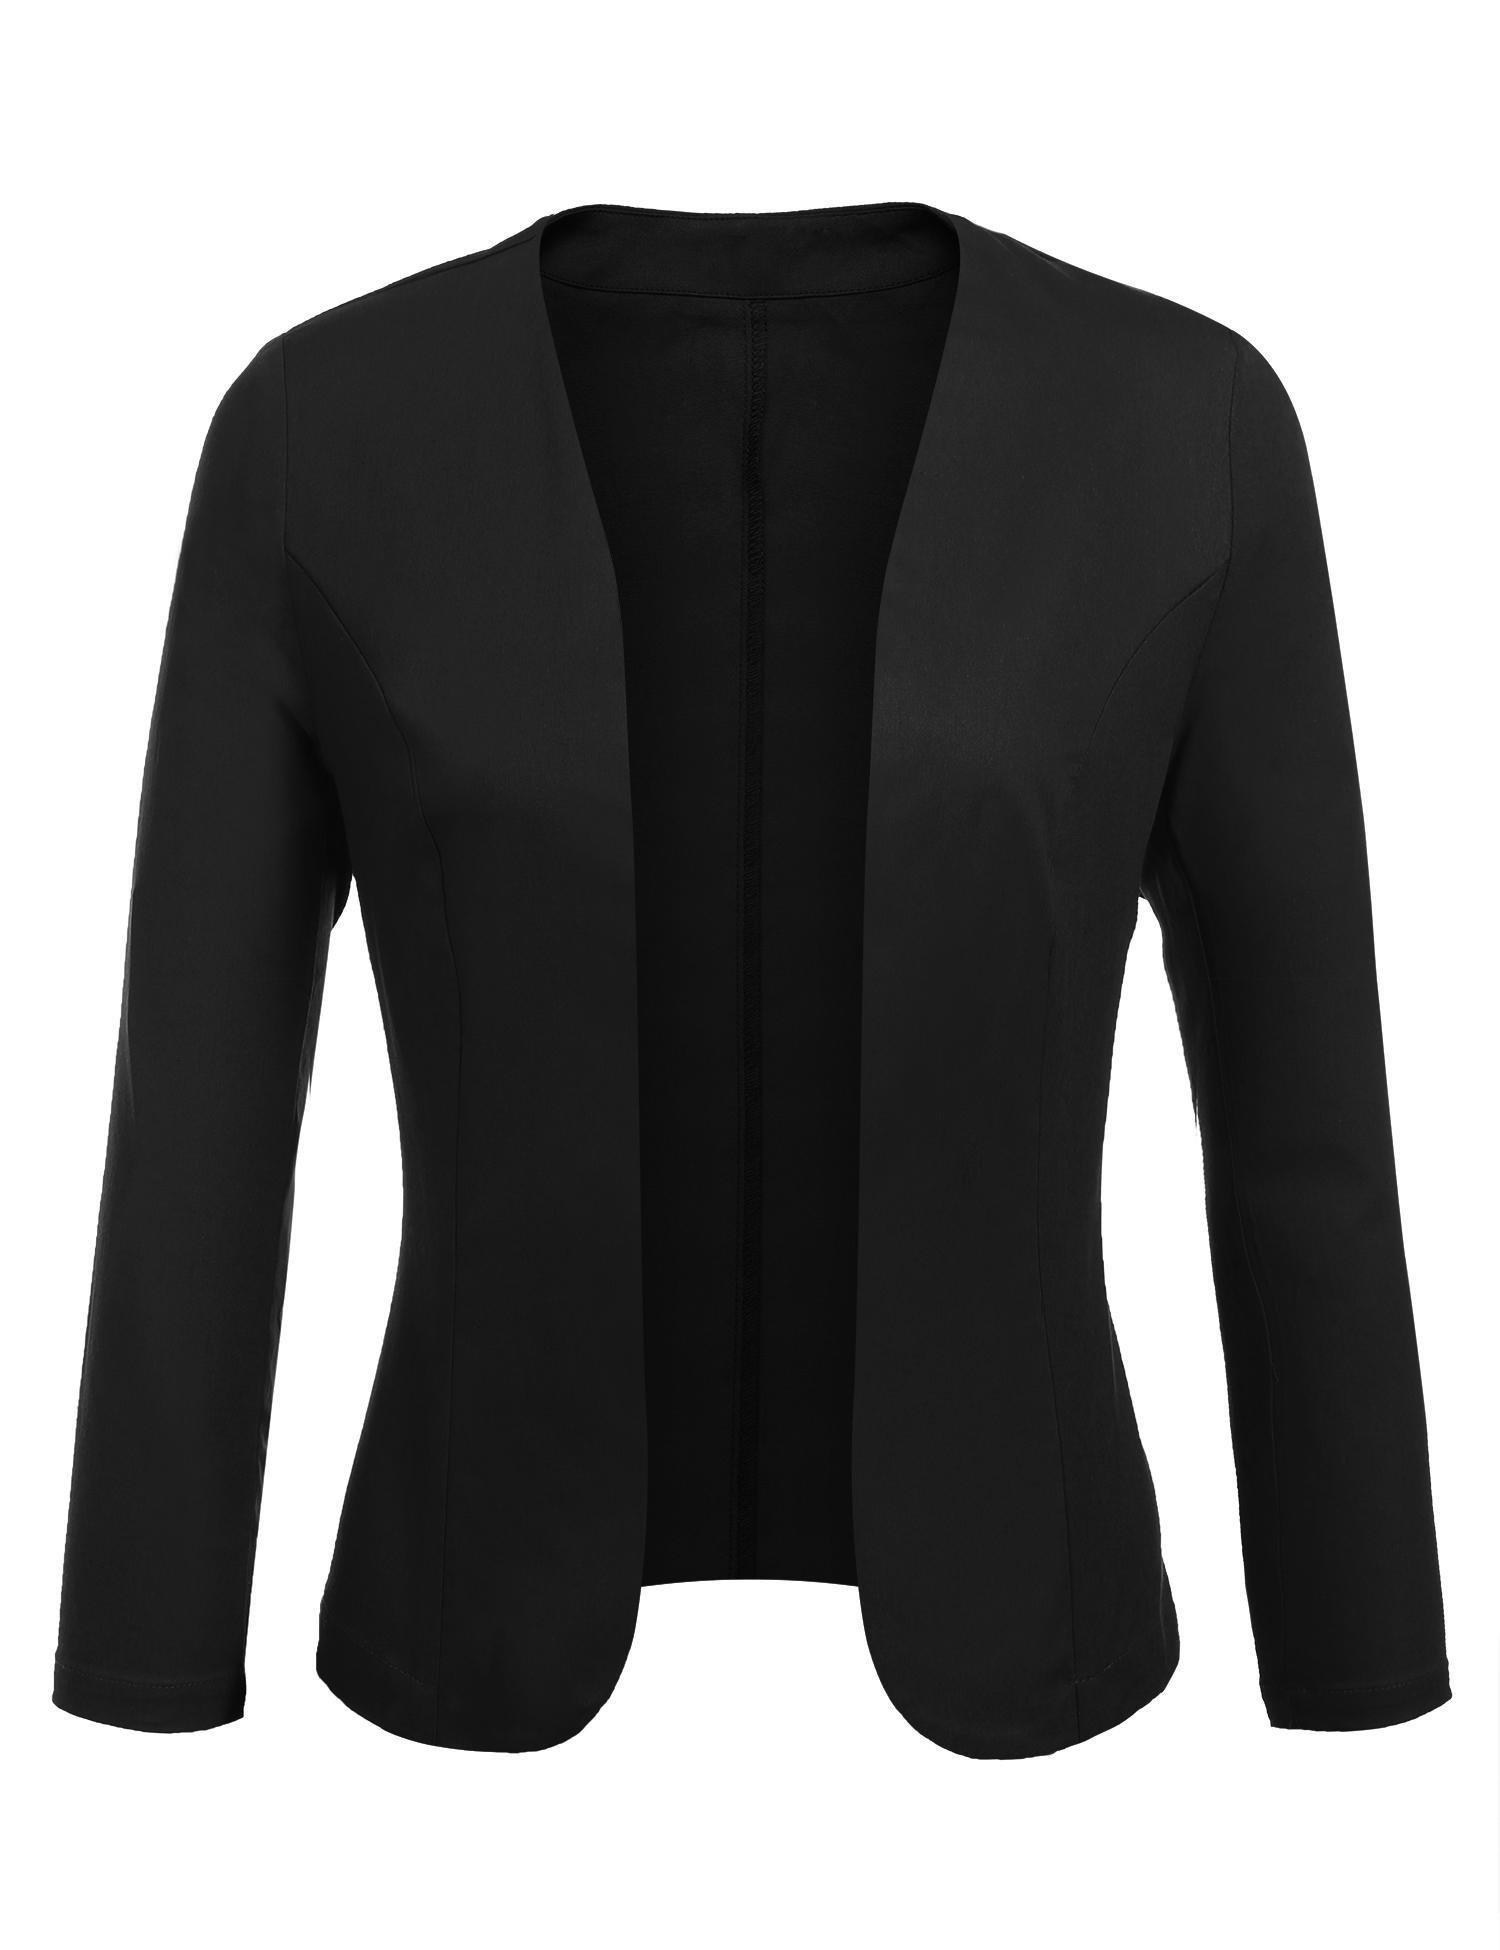 Concep Women's Cropped Blazer Casual Work Office Jacket Lightweight Slim Fit Cardigan (Black, L)